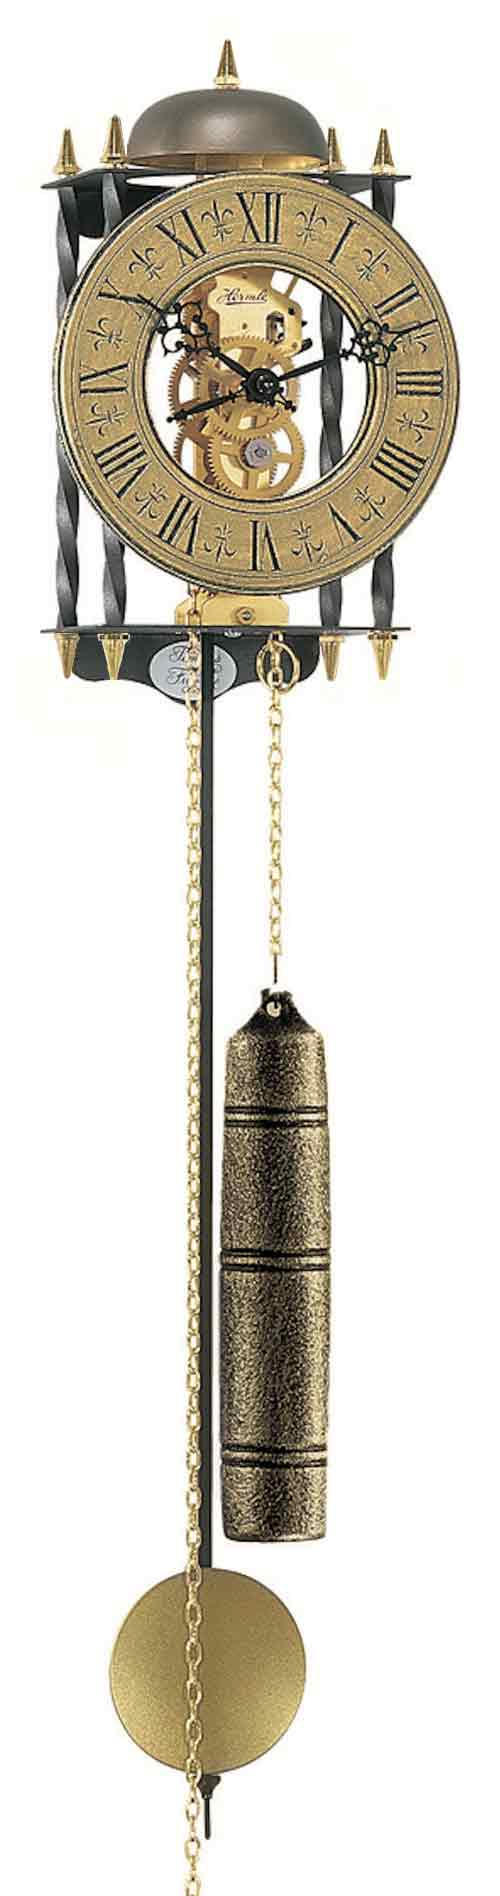 Hermle Stamford 70504 000701 Dial Skeleton Clock The